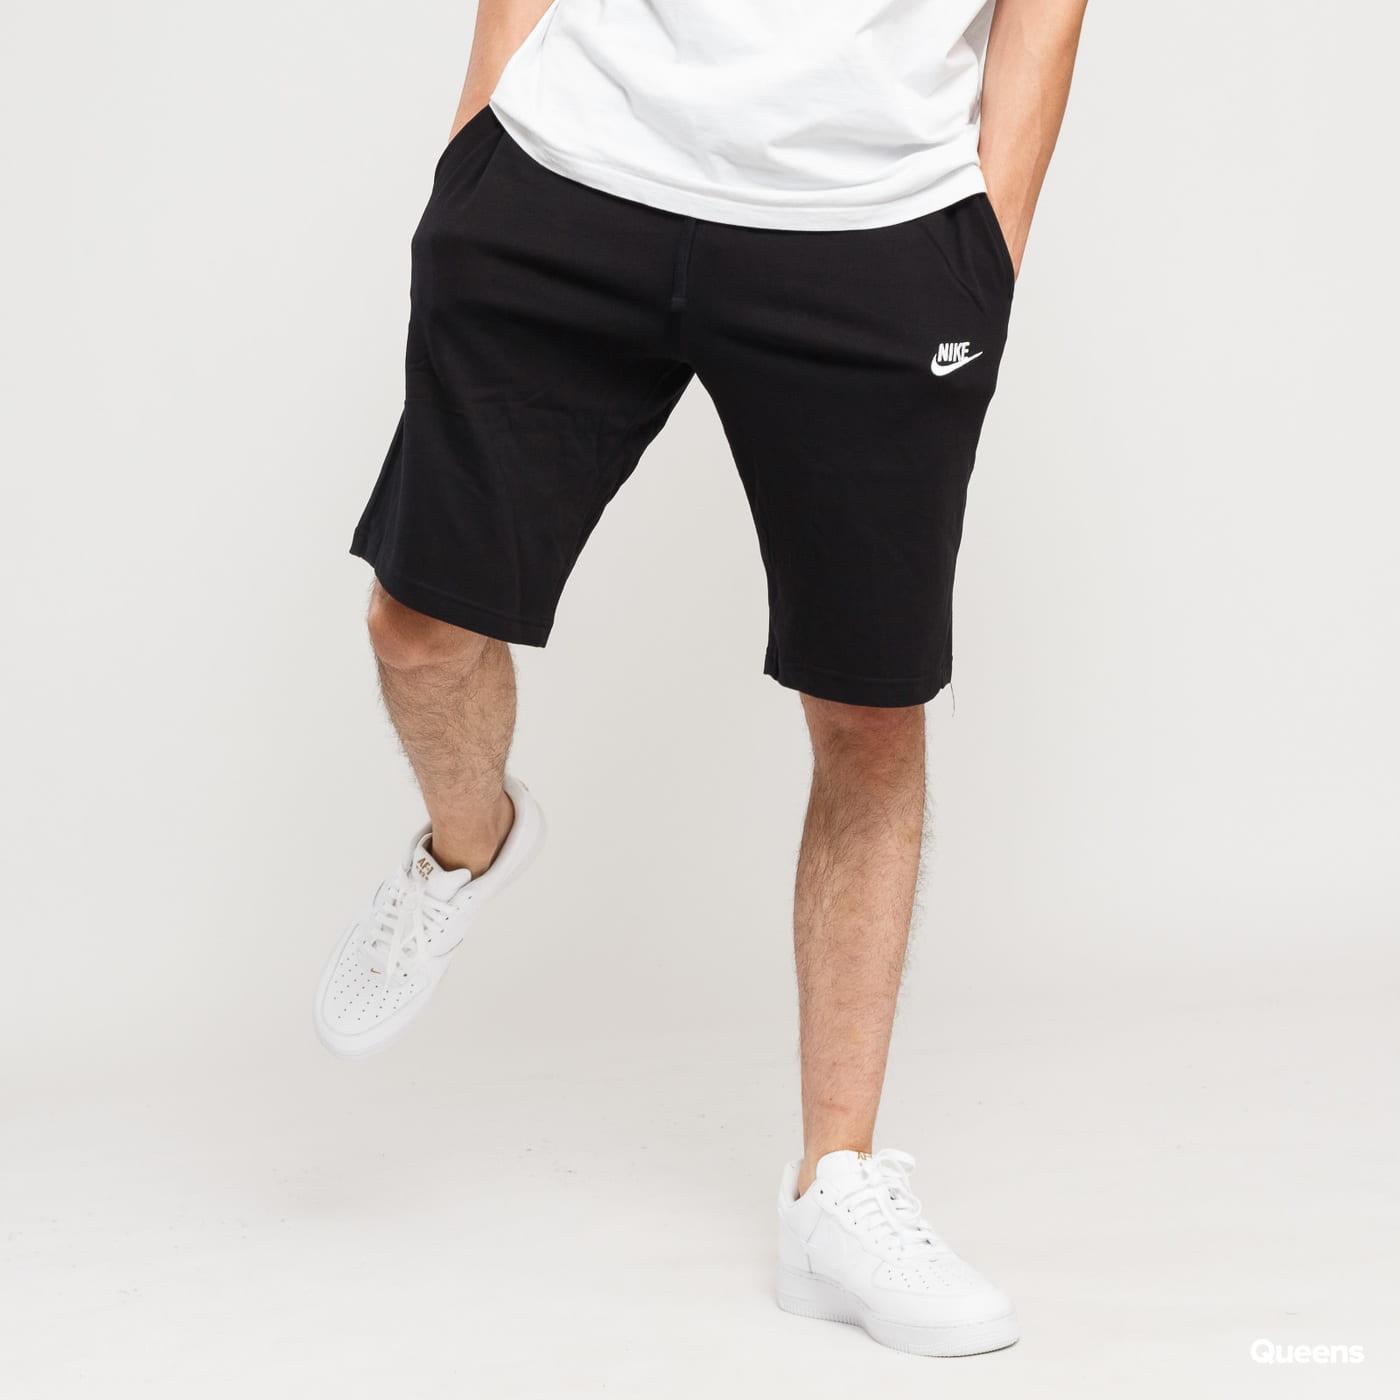 890a3fdb1c94 Sweat Shorts Nike M NSW Club Short Jersey (804419-010)– Queens 💚